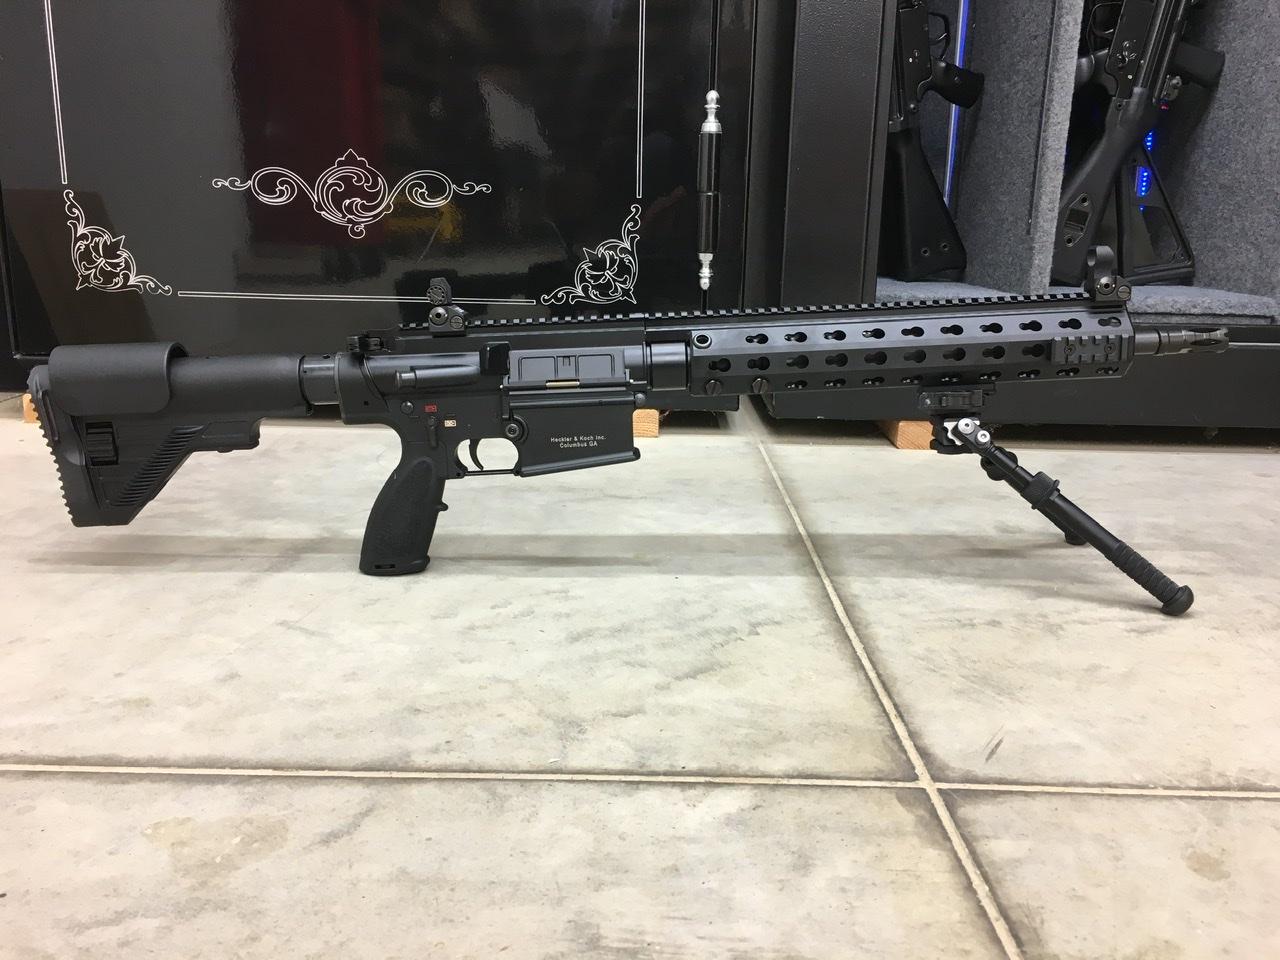 My HK MR762 so far-5711499d-394c-4661-af8e-637973ba3299_1581559022976.jpeg